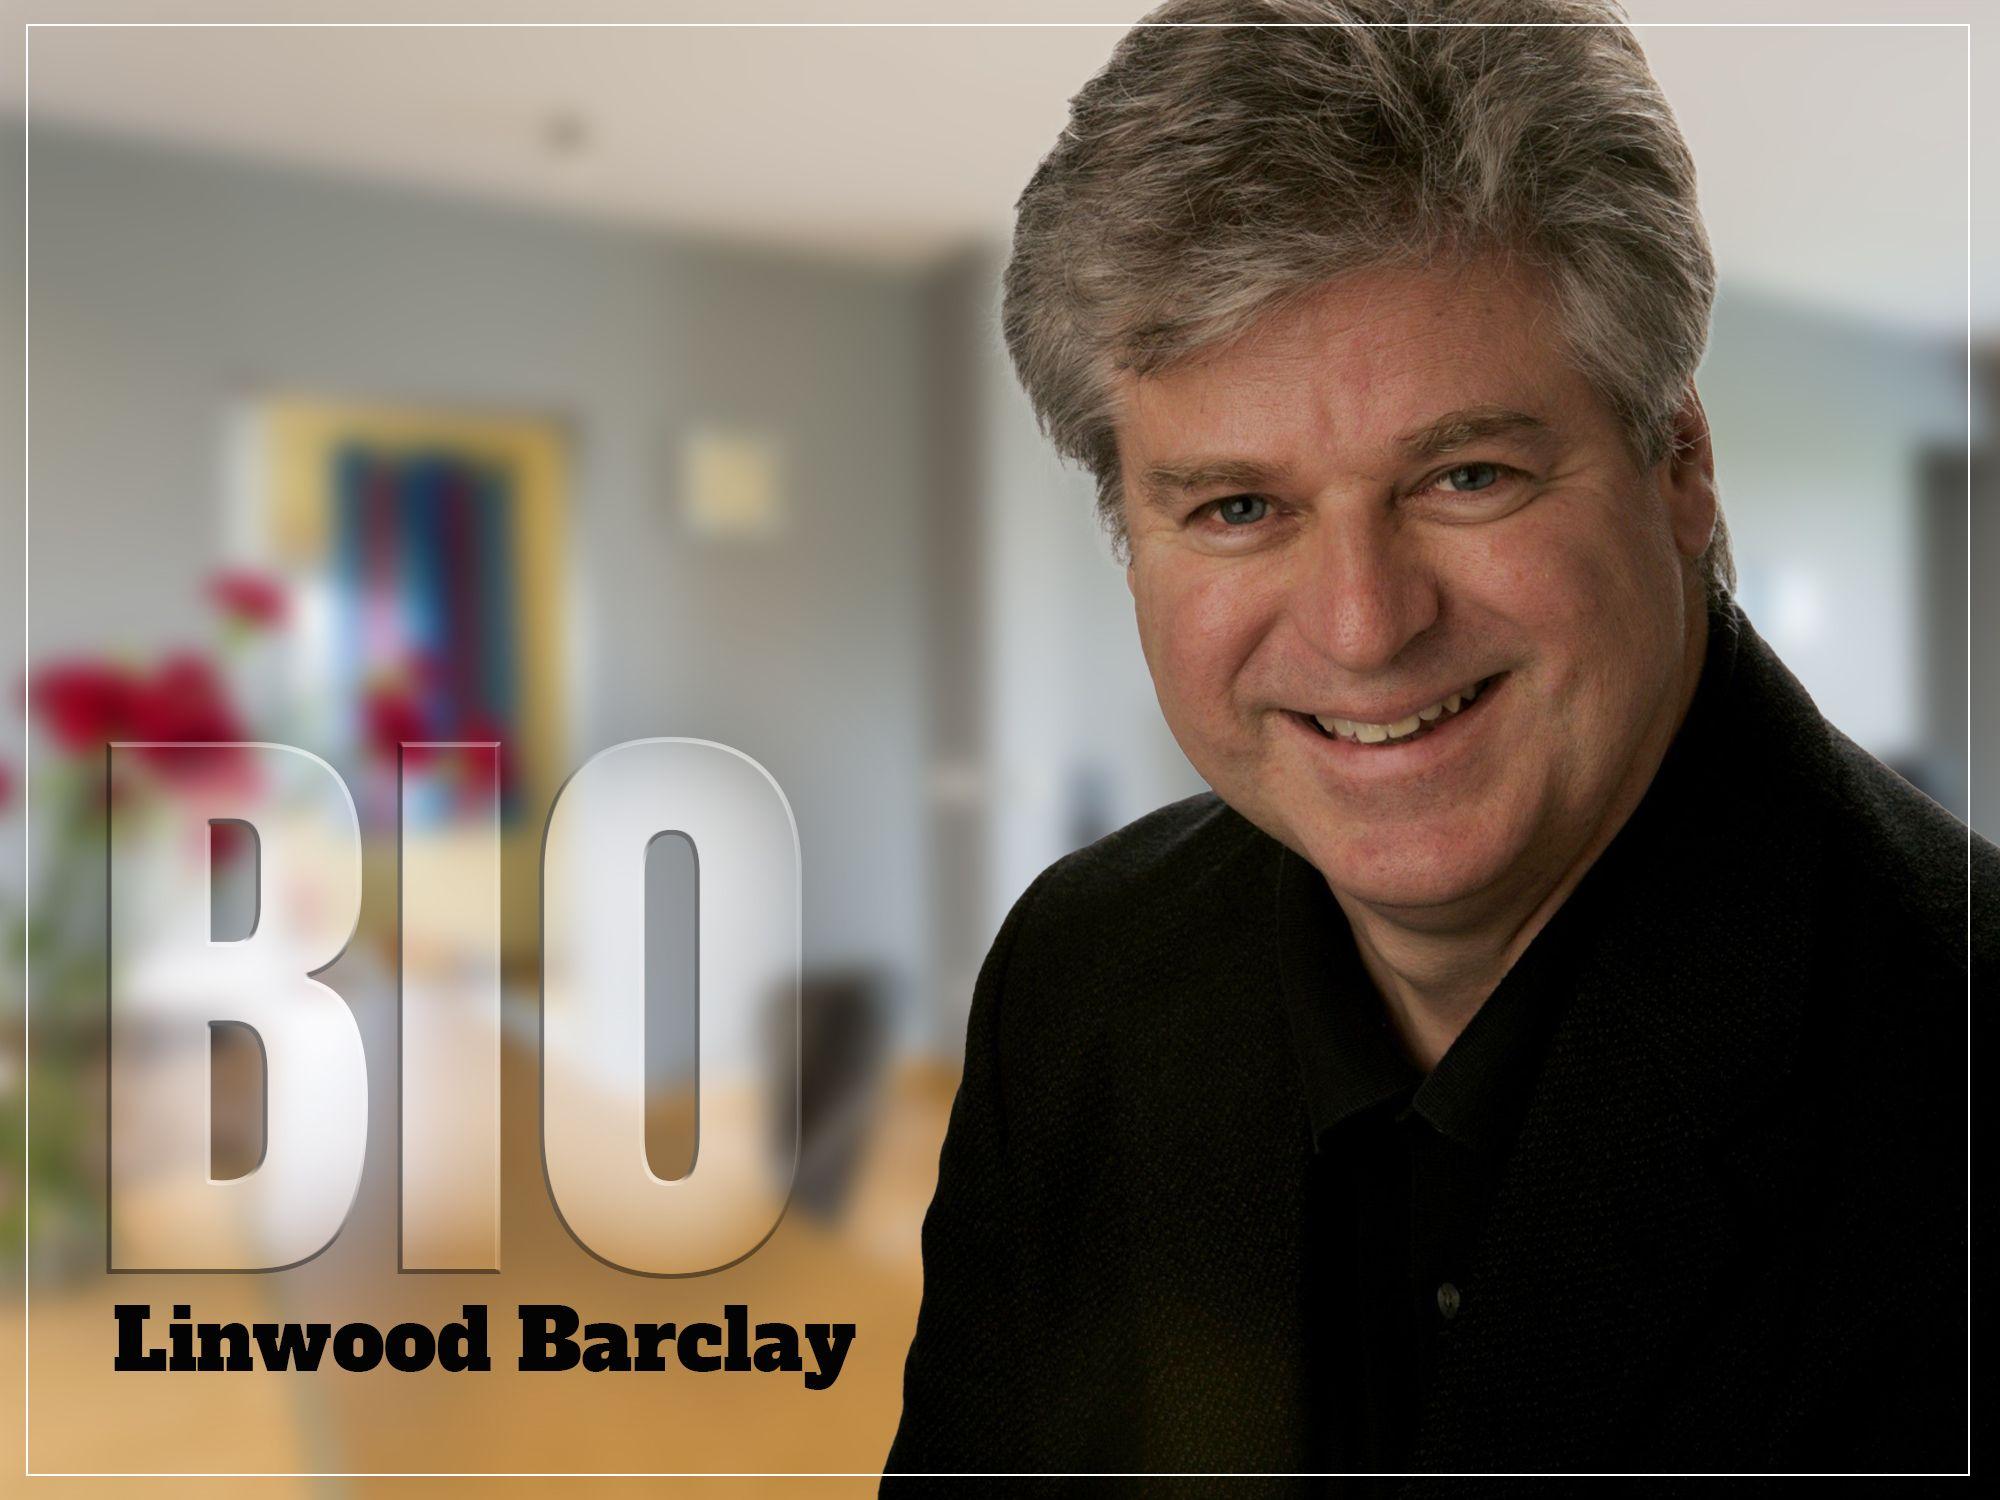 Linwood Barclay